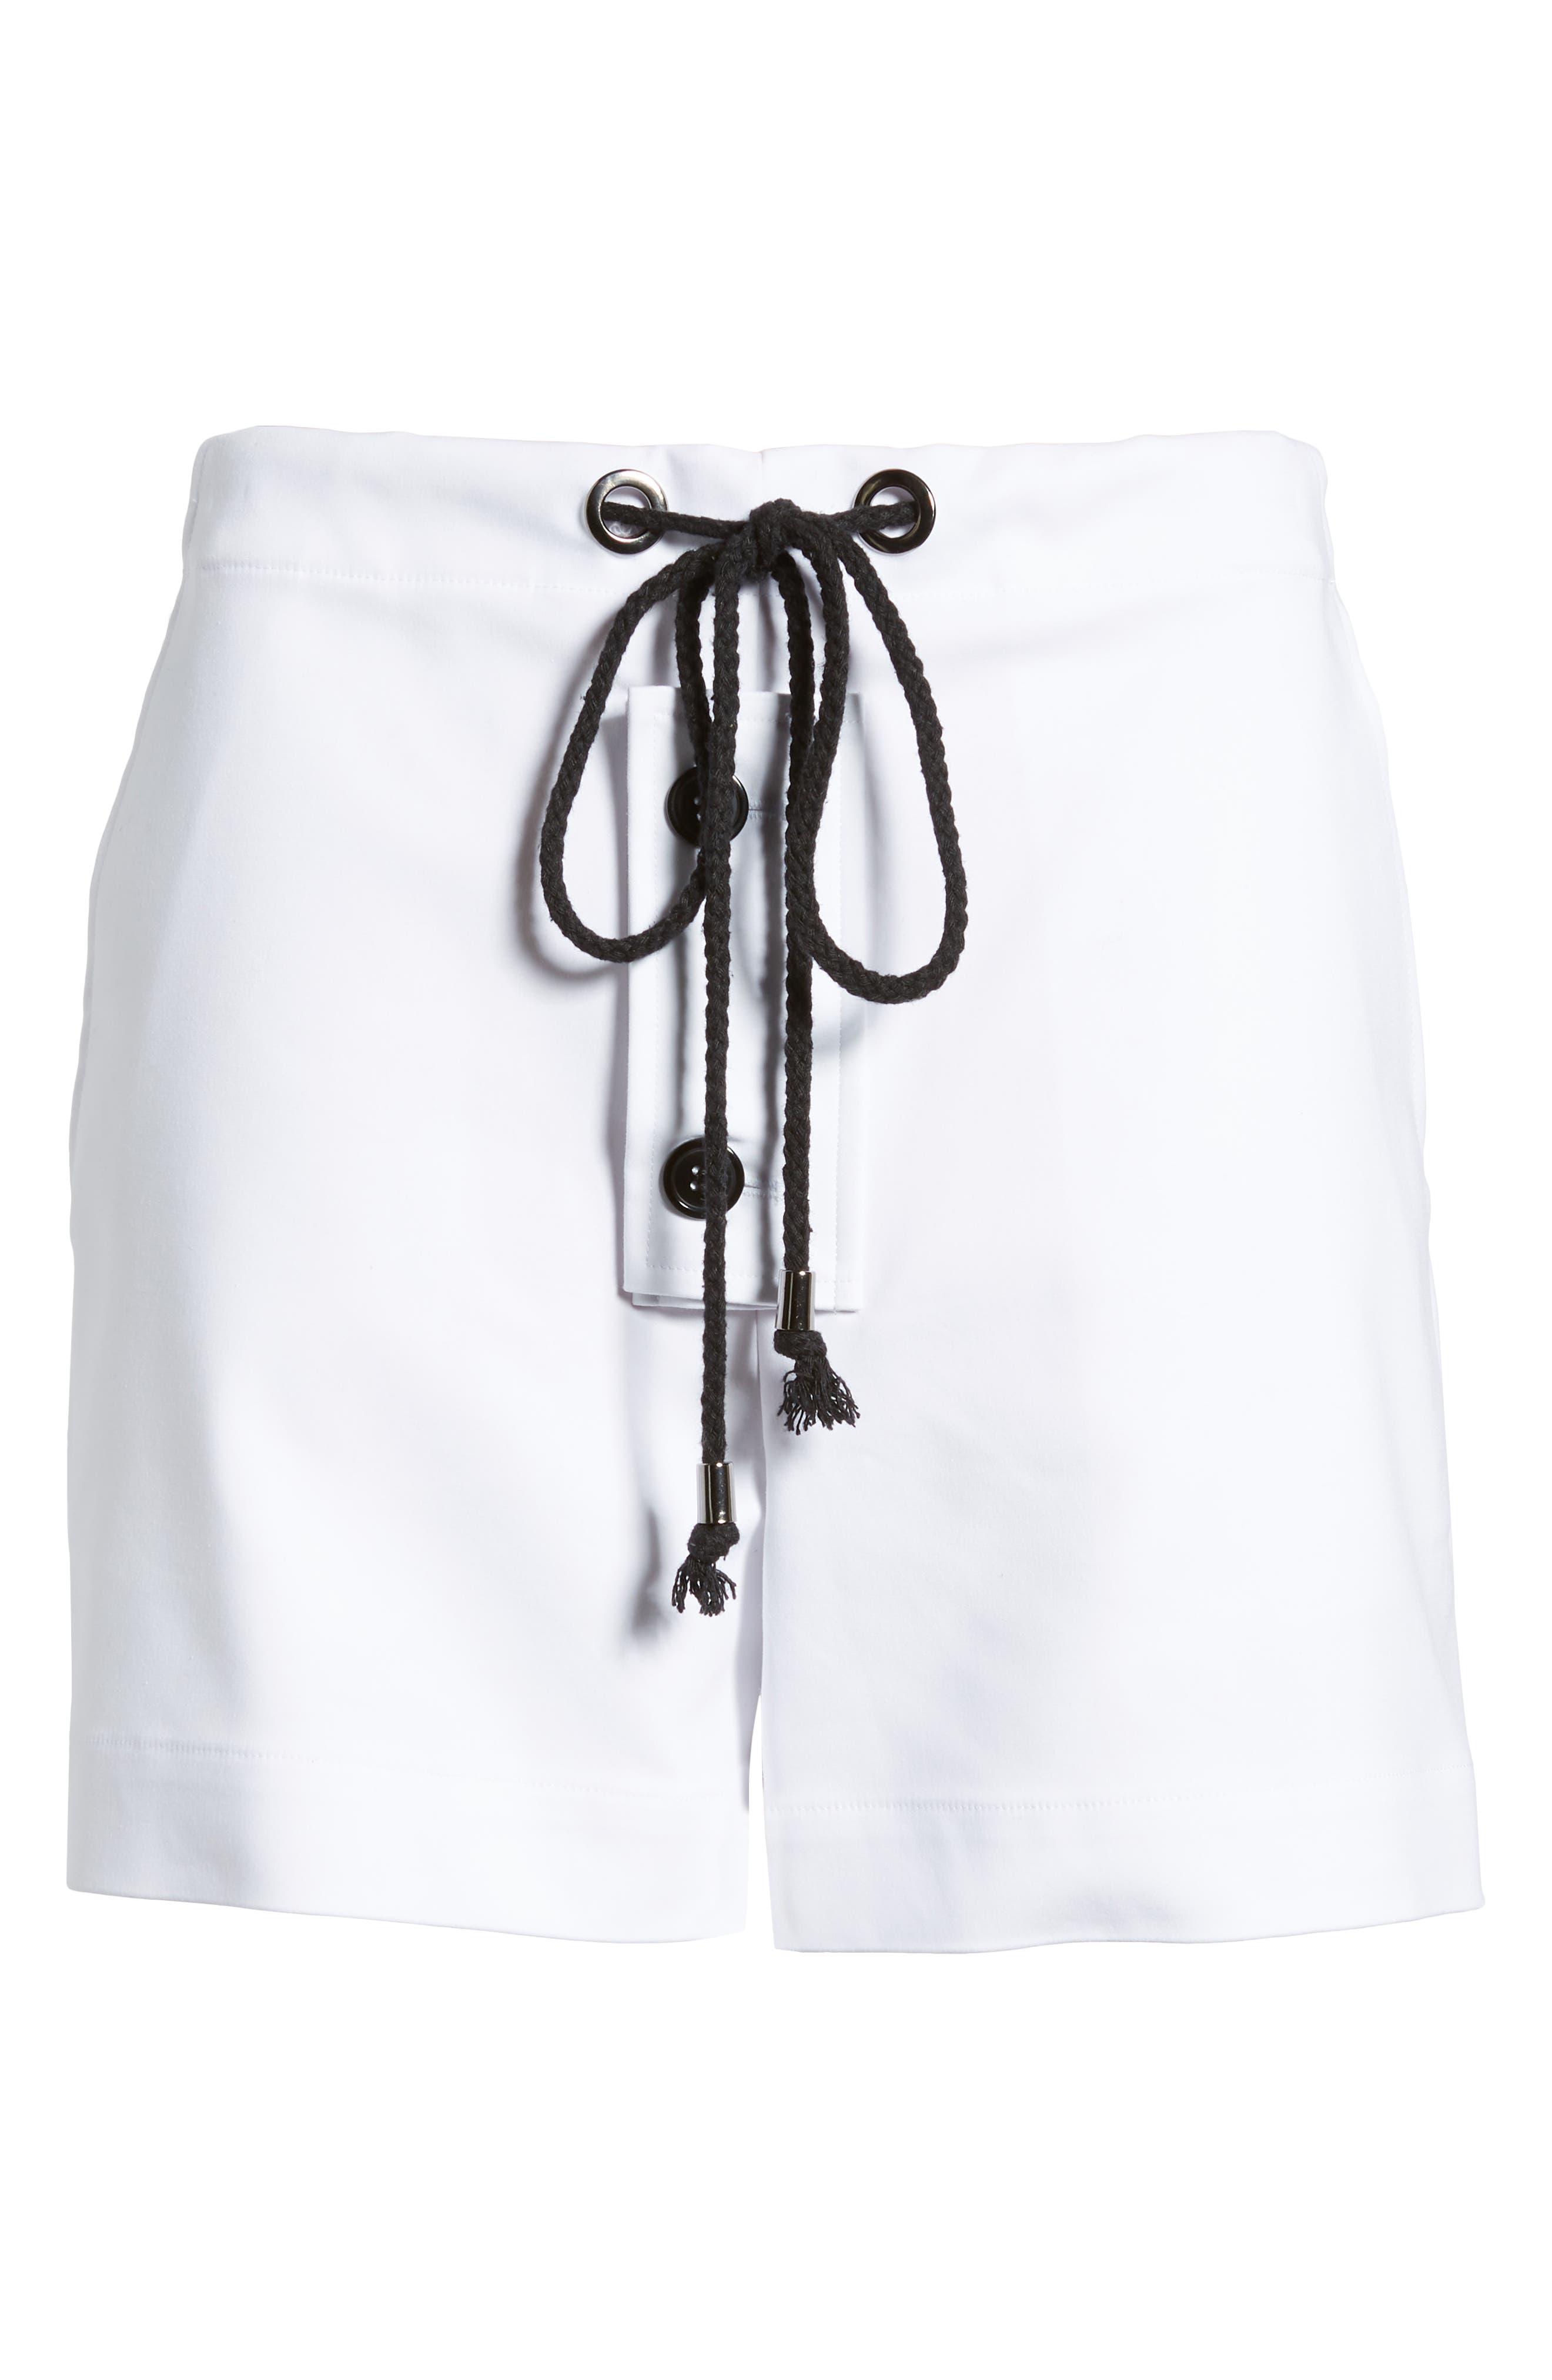 Park South Shorts,                             Alternate thumbnail 6, color,                             White